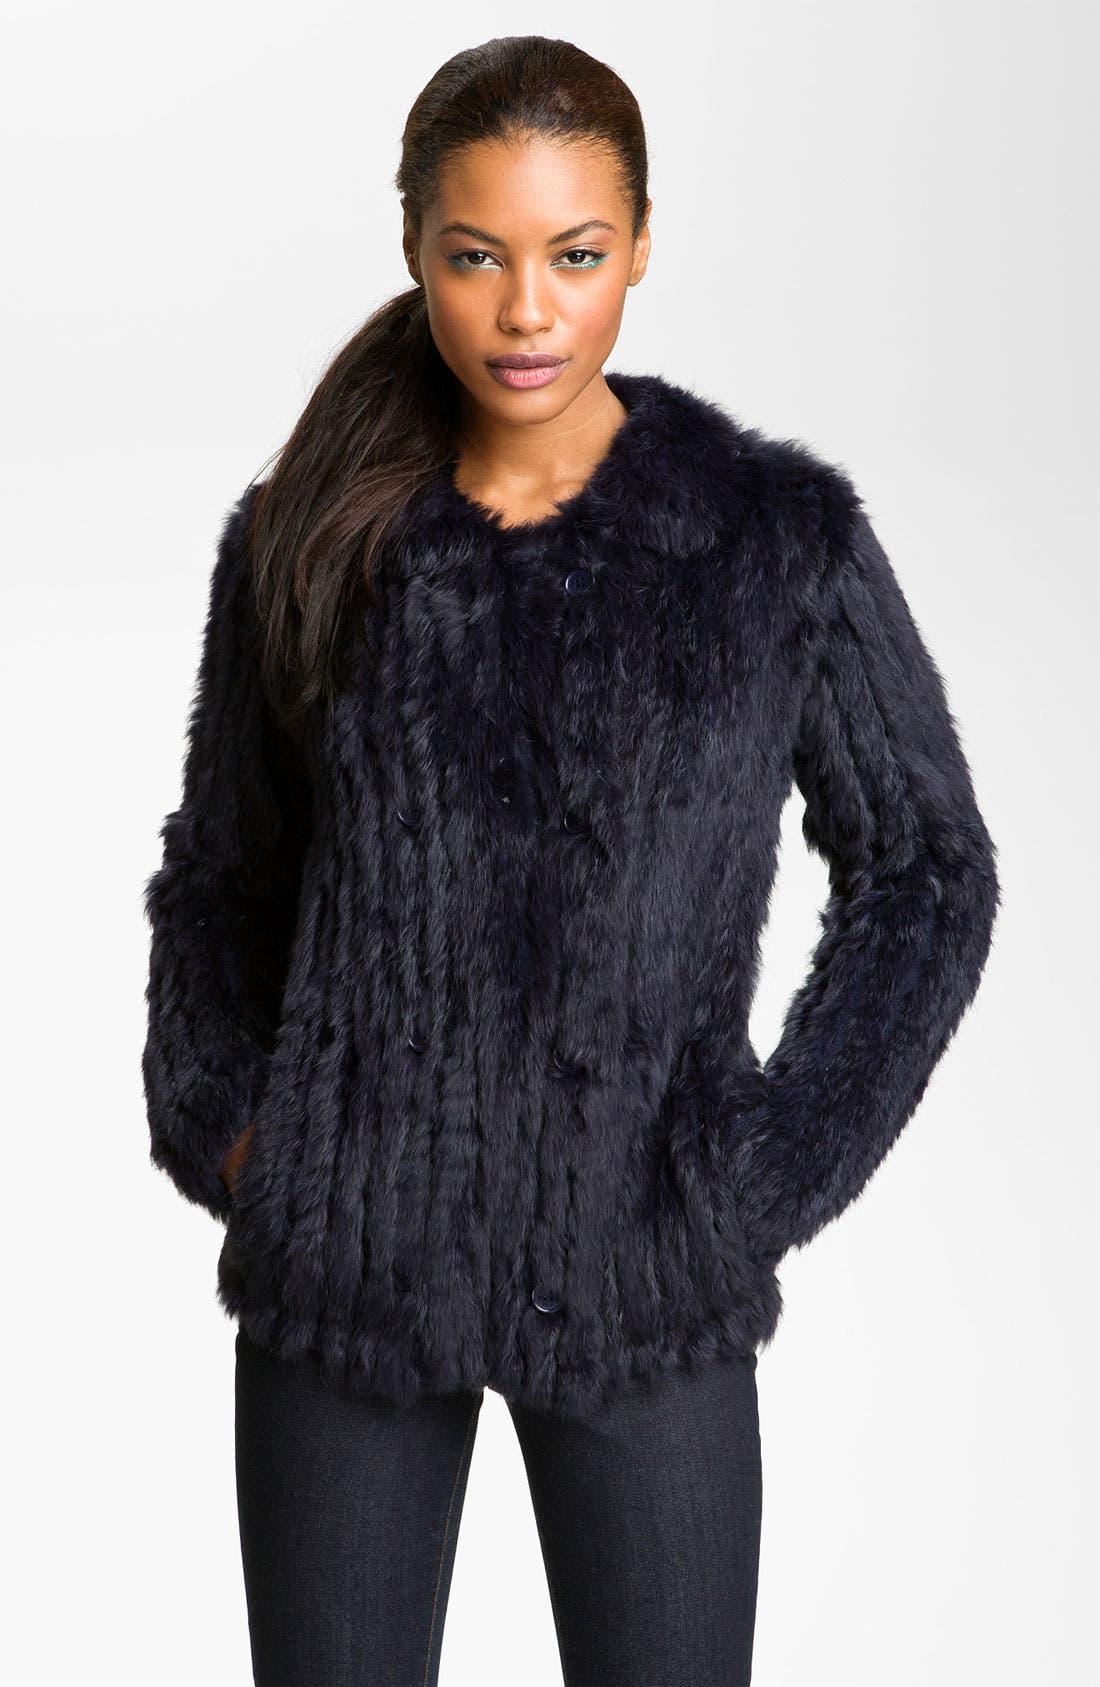 Main Image - MARC BY MARC JACOBS 'Katrina' Genuine Rabbit Fur Jacket